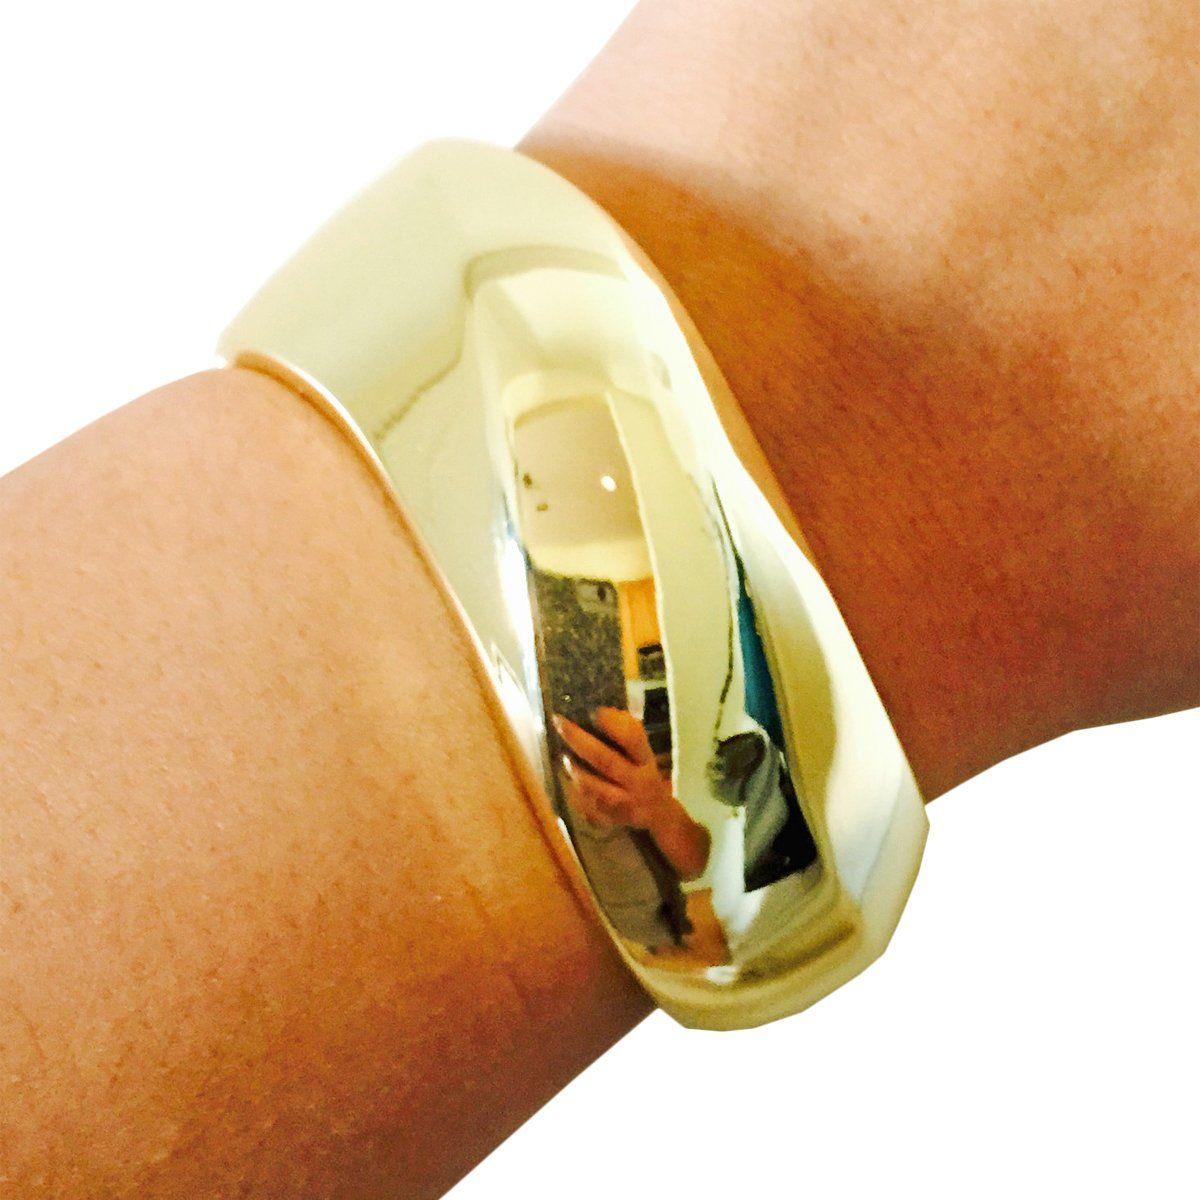 Fitbit bracelet for fitbit flex or flex fitness activity trackers